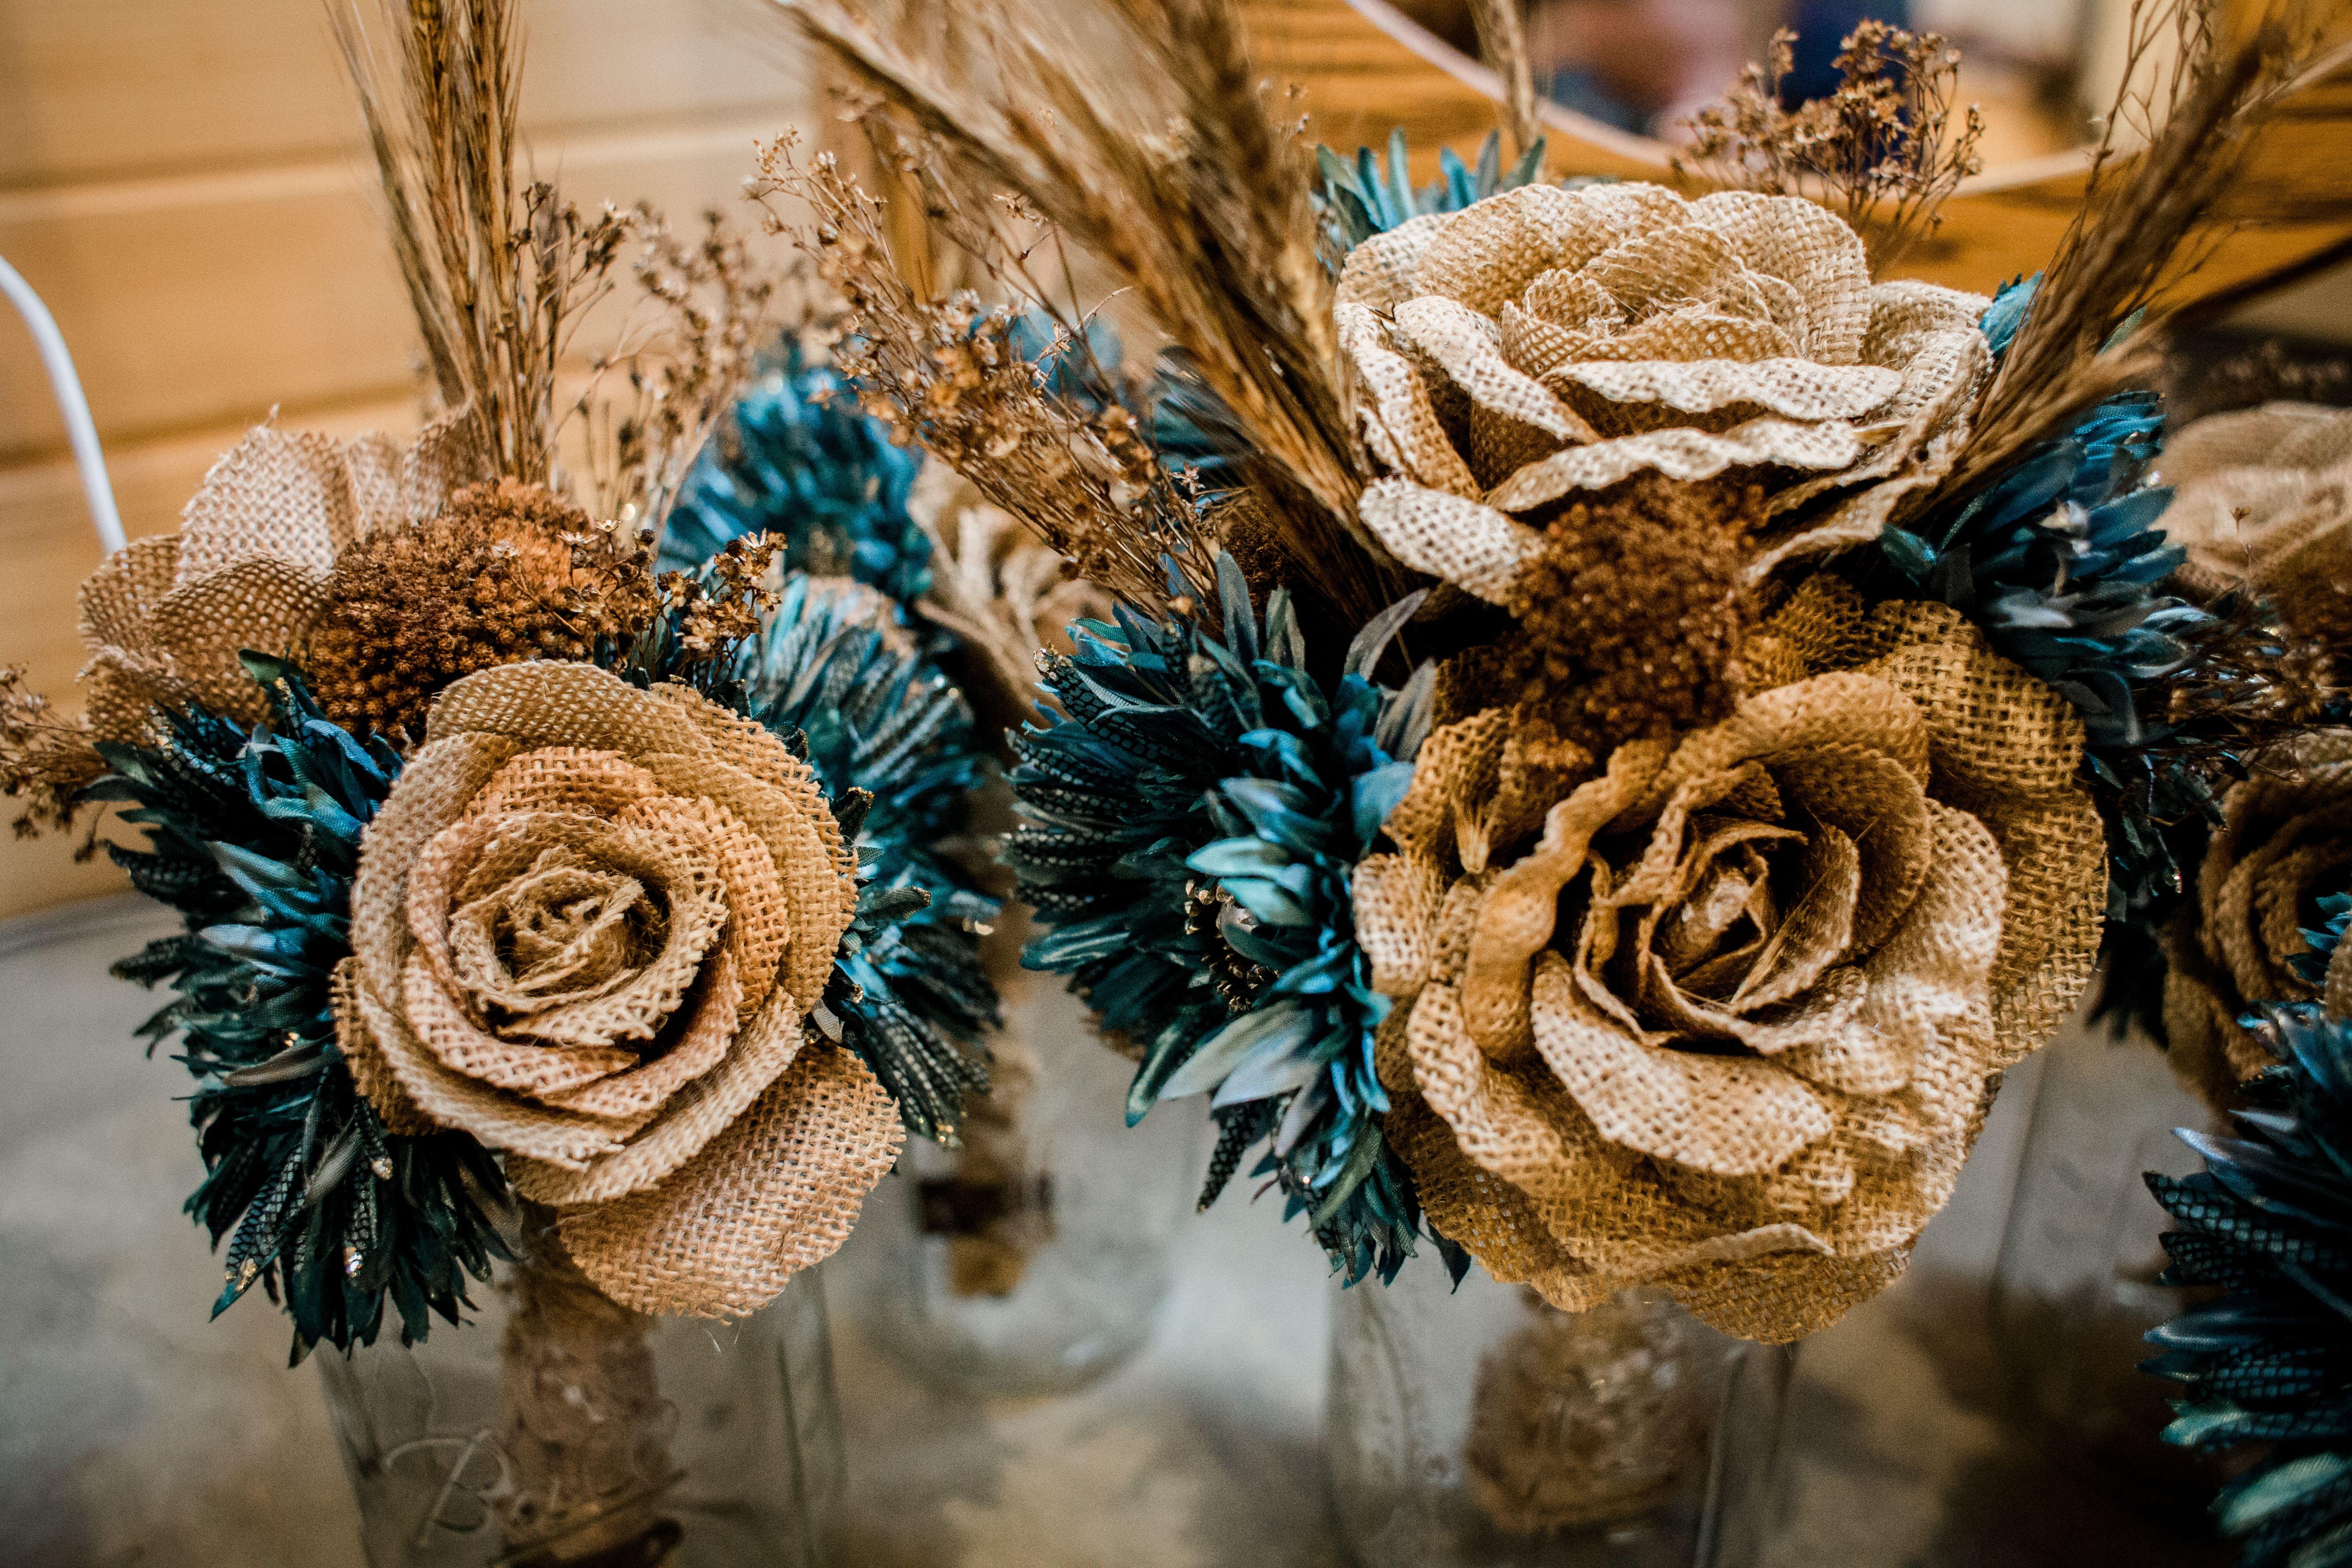 Diy brown and teal floral arrangements gettin hitched pinterest diy brown and teal floral arrangements izmirmasajfo